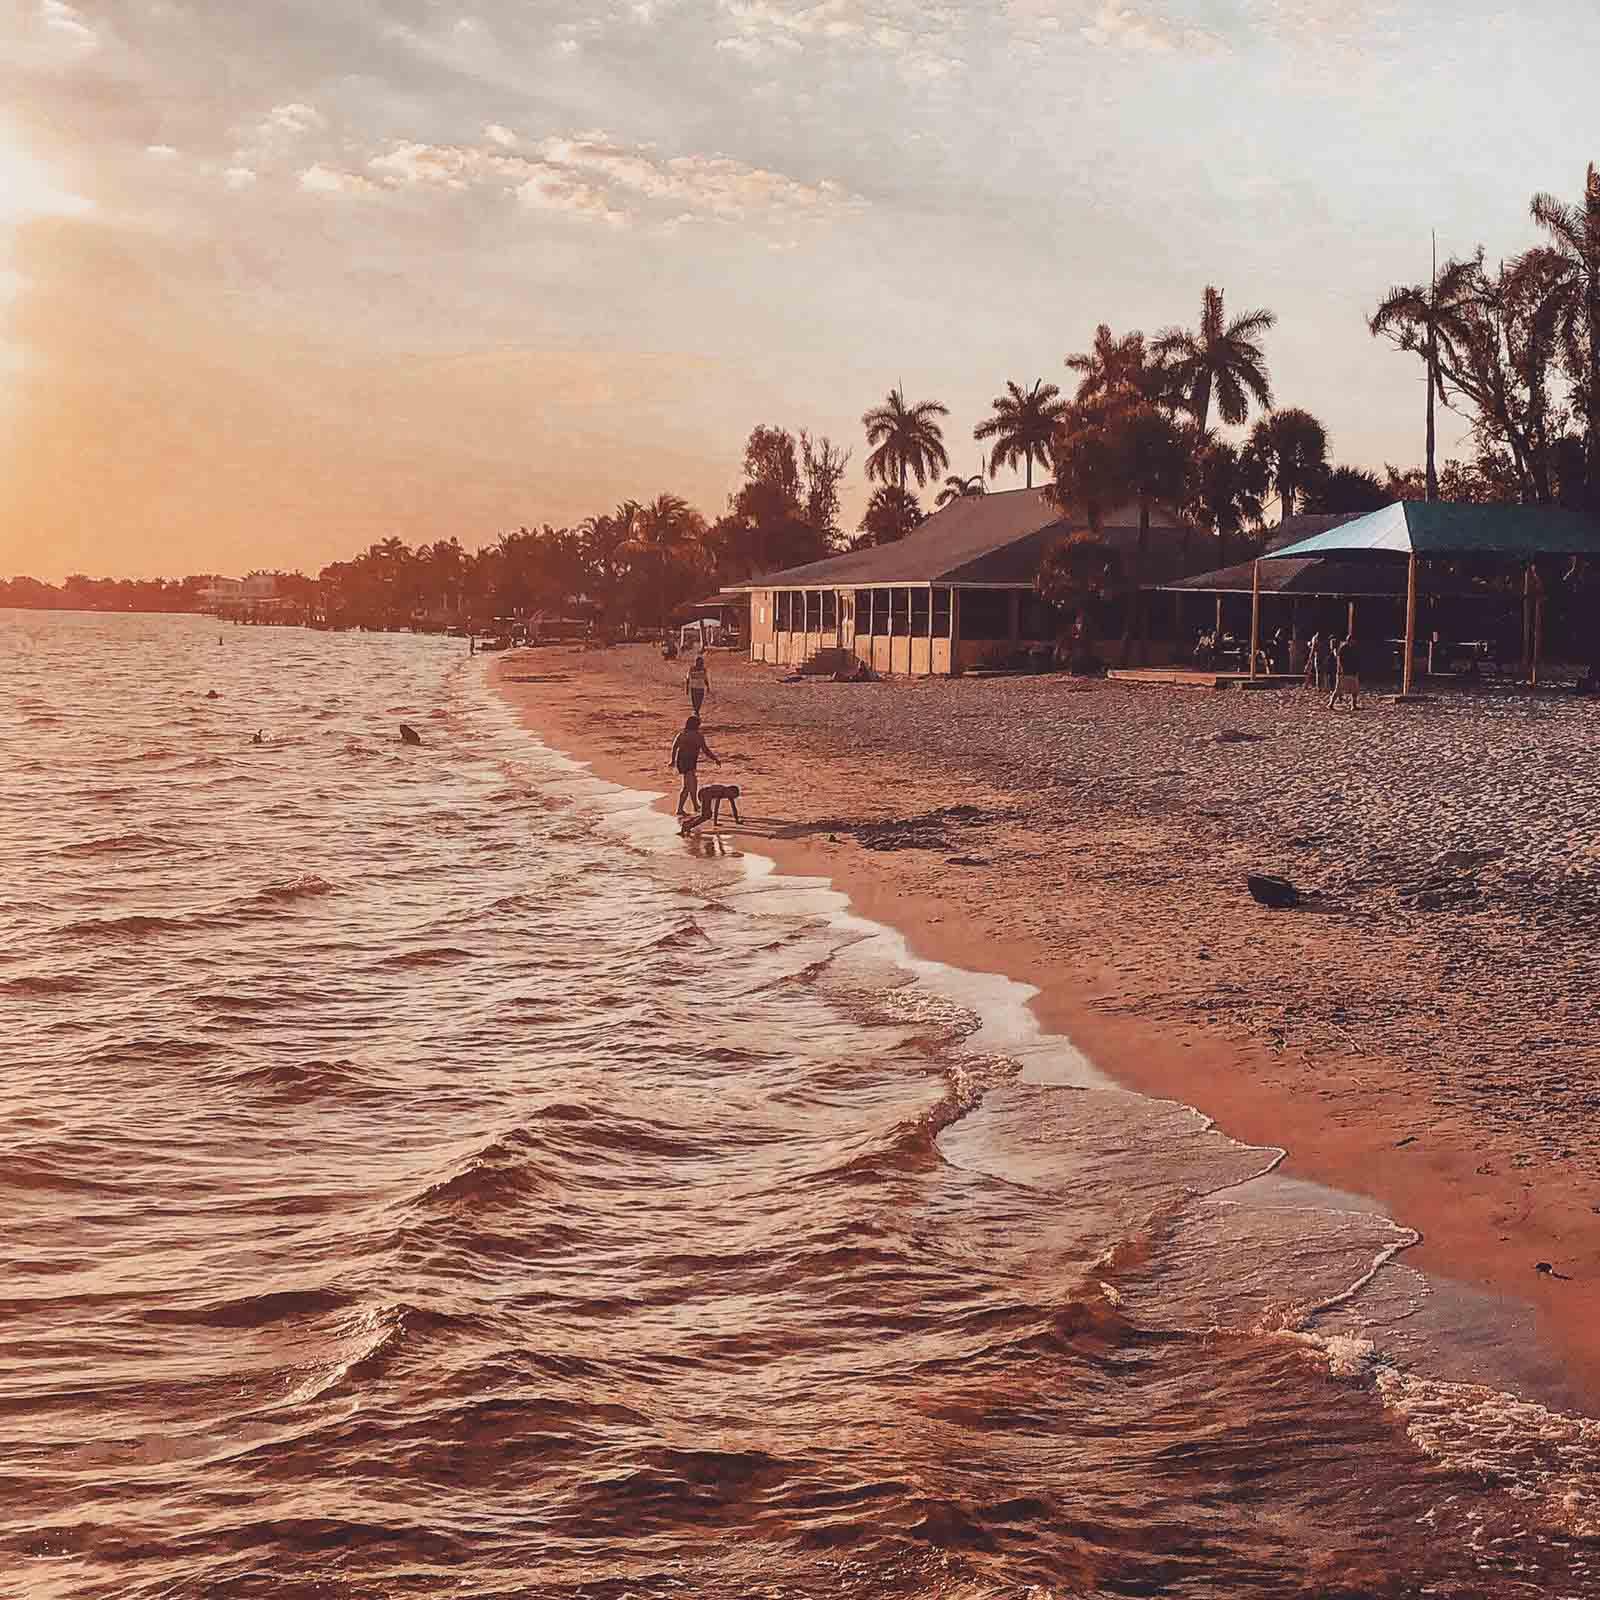 Blick auf das Meer in Florida